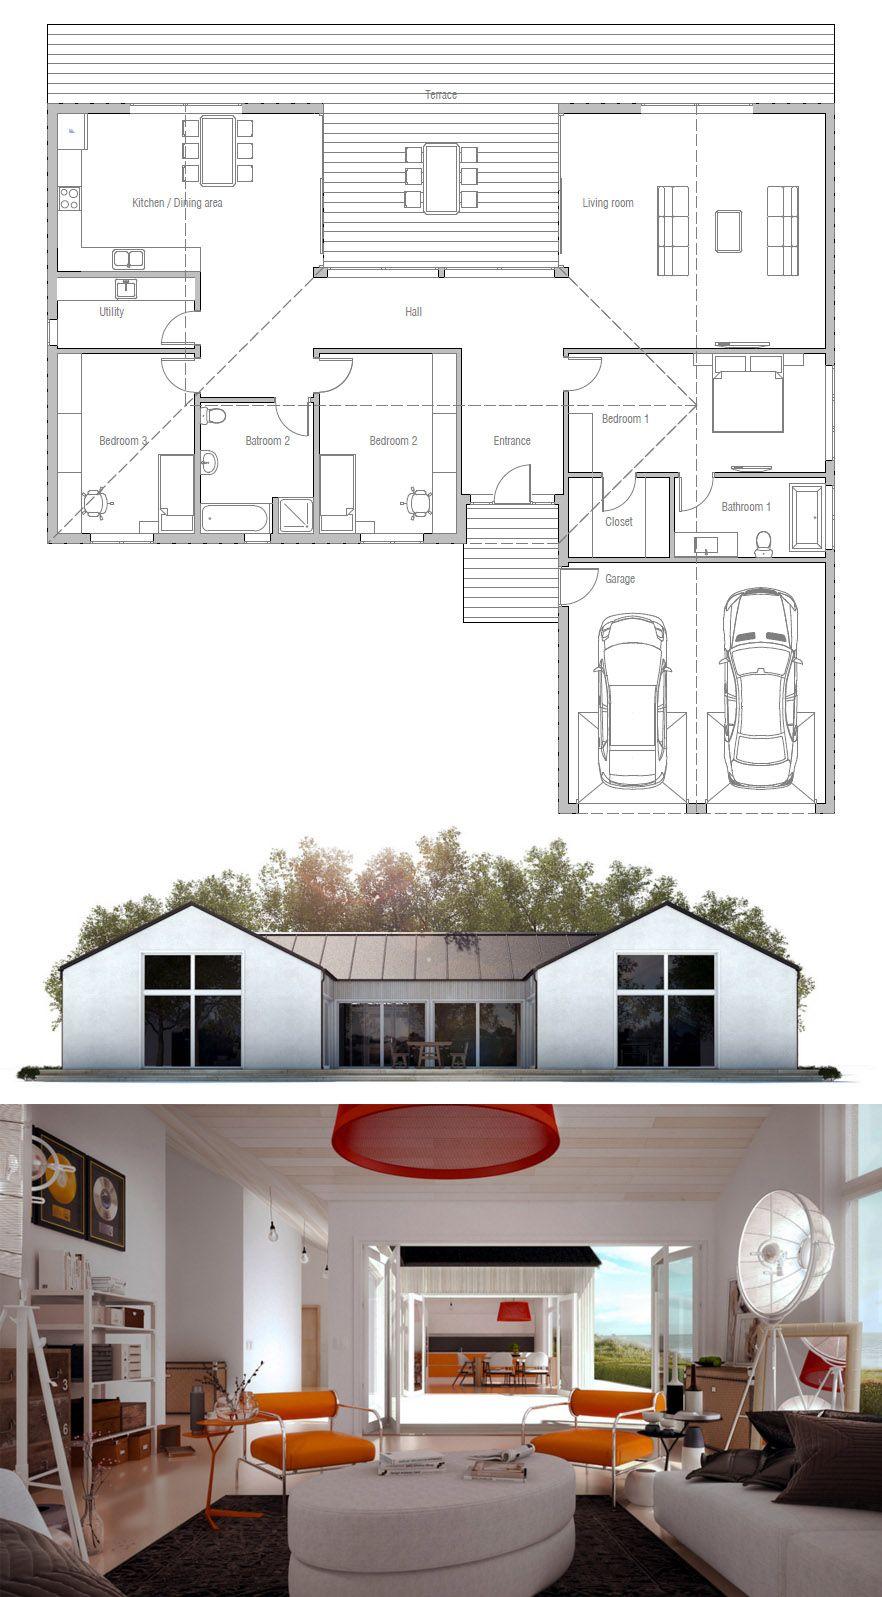 Home floor plans house design modernfarmhouse adhouseplans floorplans also rh pinterest